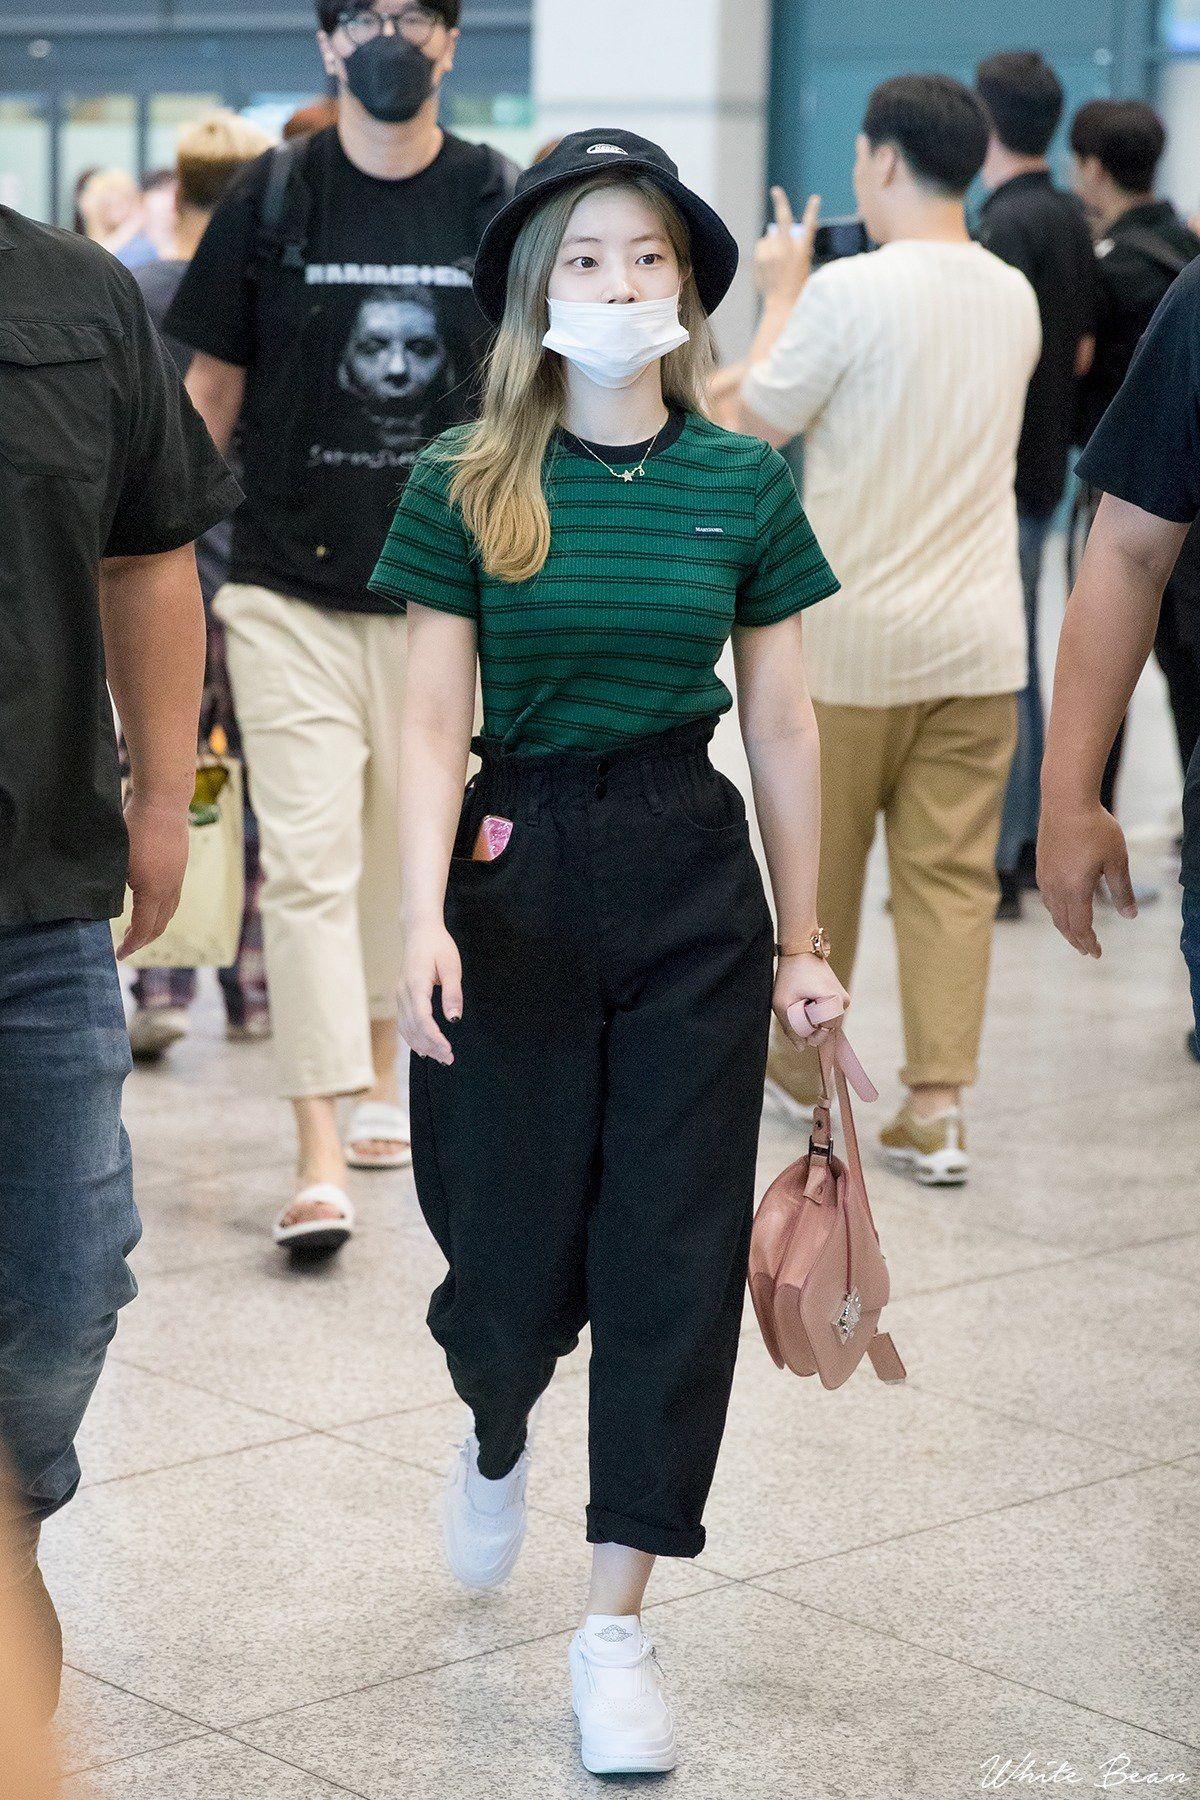 190516 Icn Korean Airport Fashion Kpop Fashion Outfits Airport Fashion Kpop